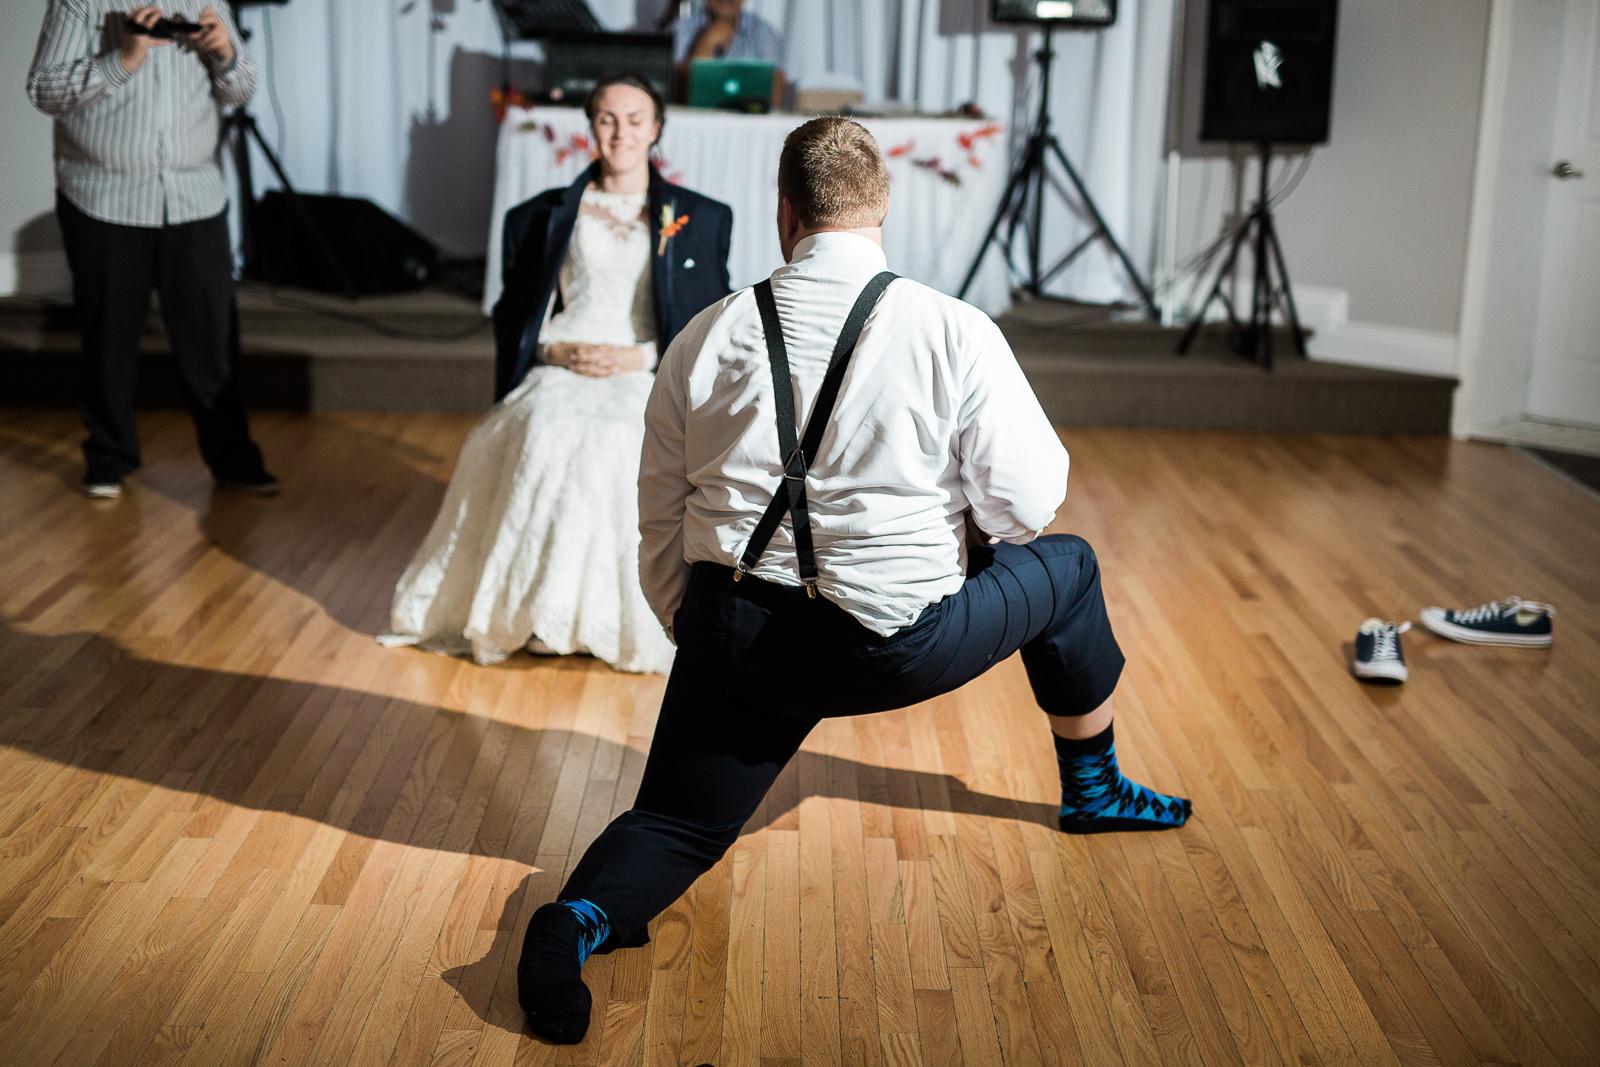 gander-wedding-photographer-158.jpg